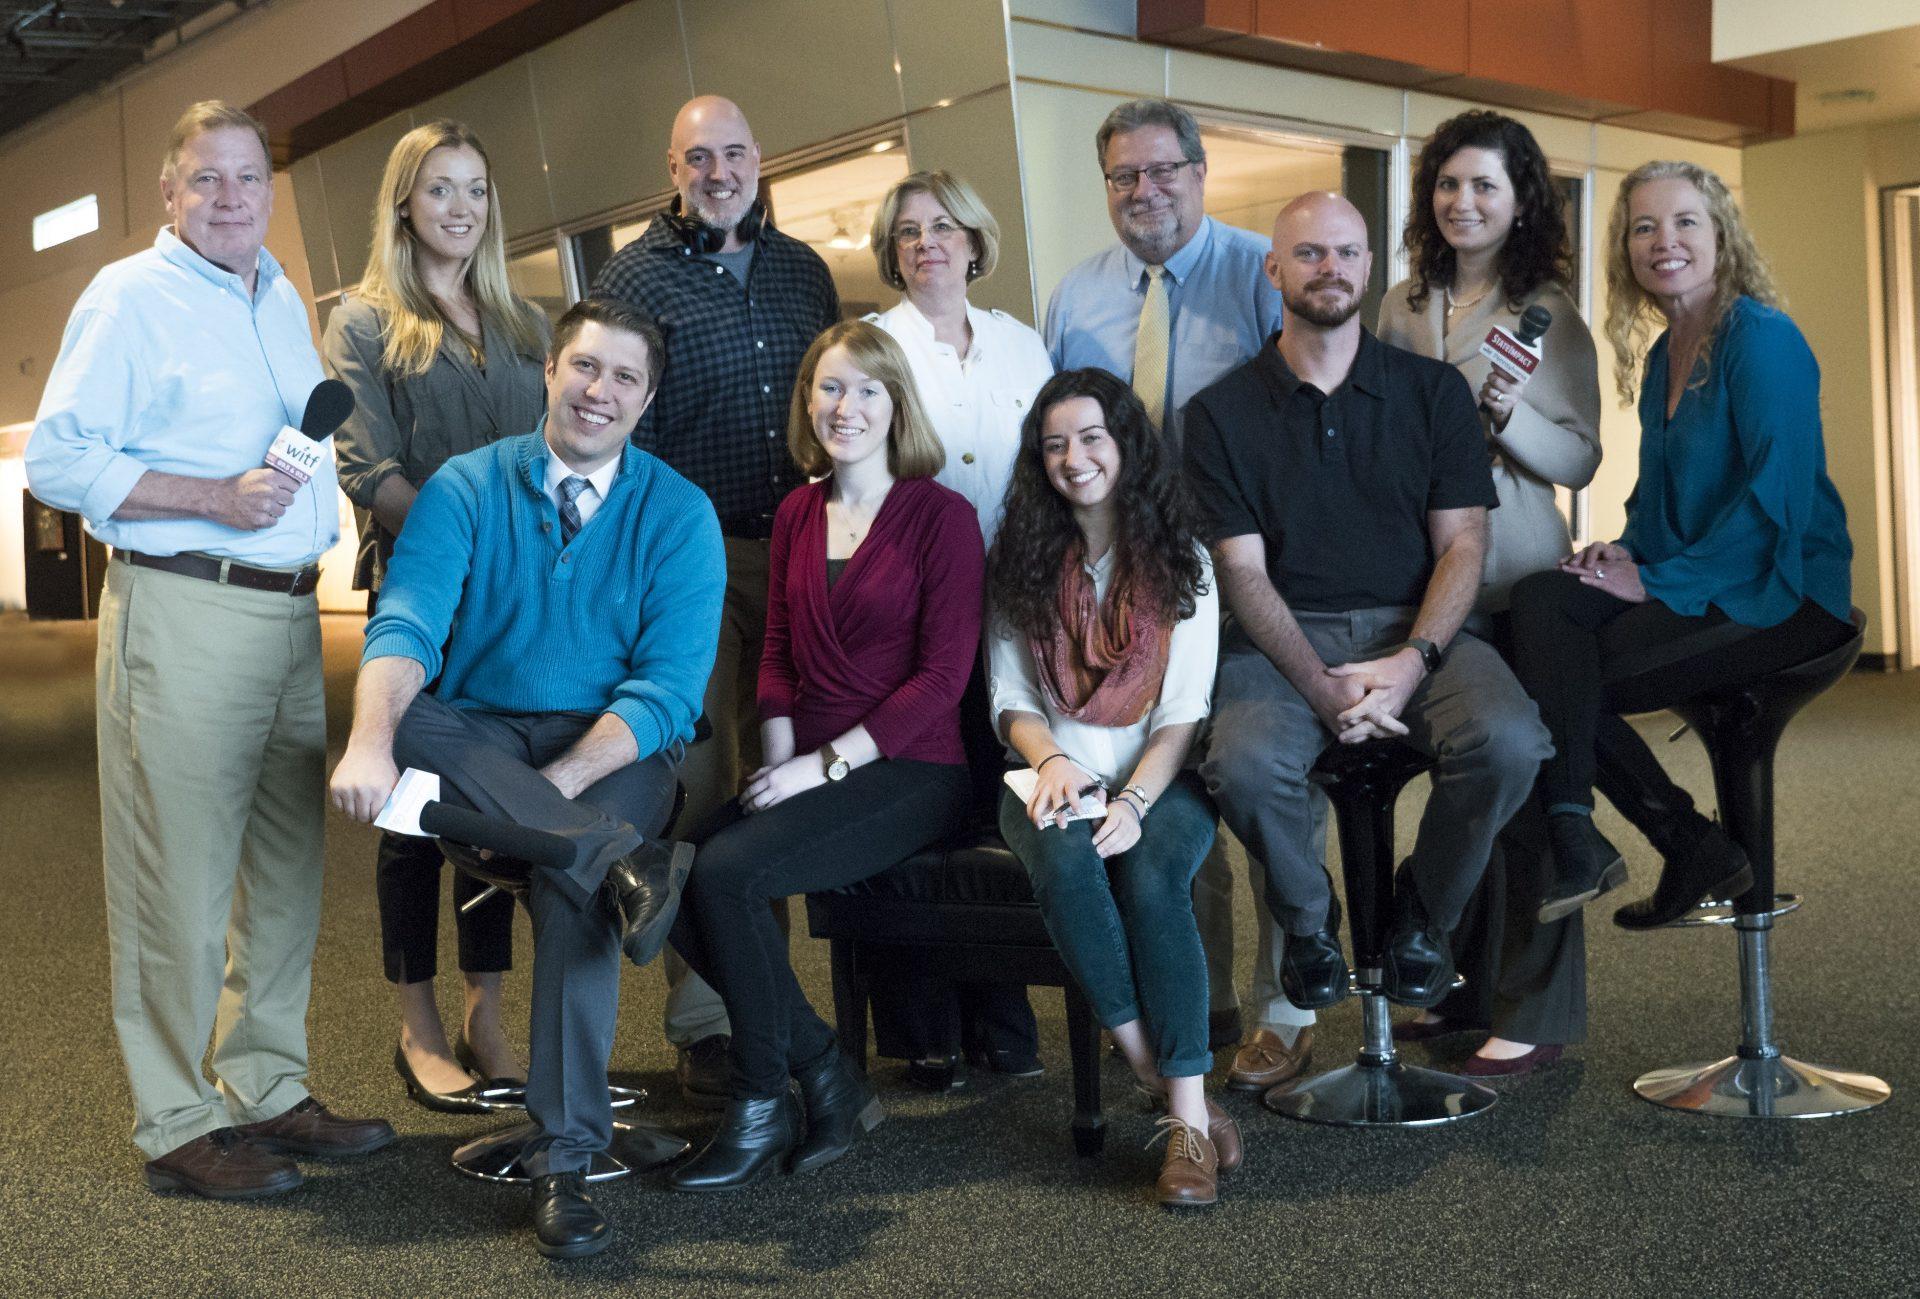 The WITF news team in October 2017. Clockwise from top left: Craig Rhodes, Emily Previti, Tim Lambert, Kathleen Pavelko, Scott LaMar, Marie Cusick, Cara Williams Fry, Joe Ulrich, Katie Meyer, Rachel McDevitt and Brett Sholtis.